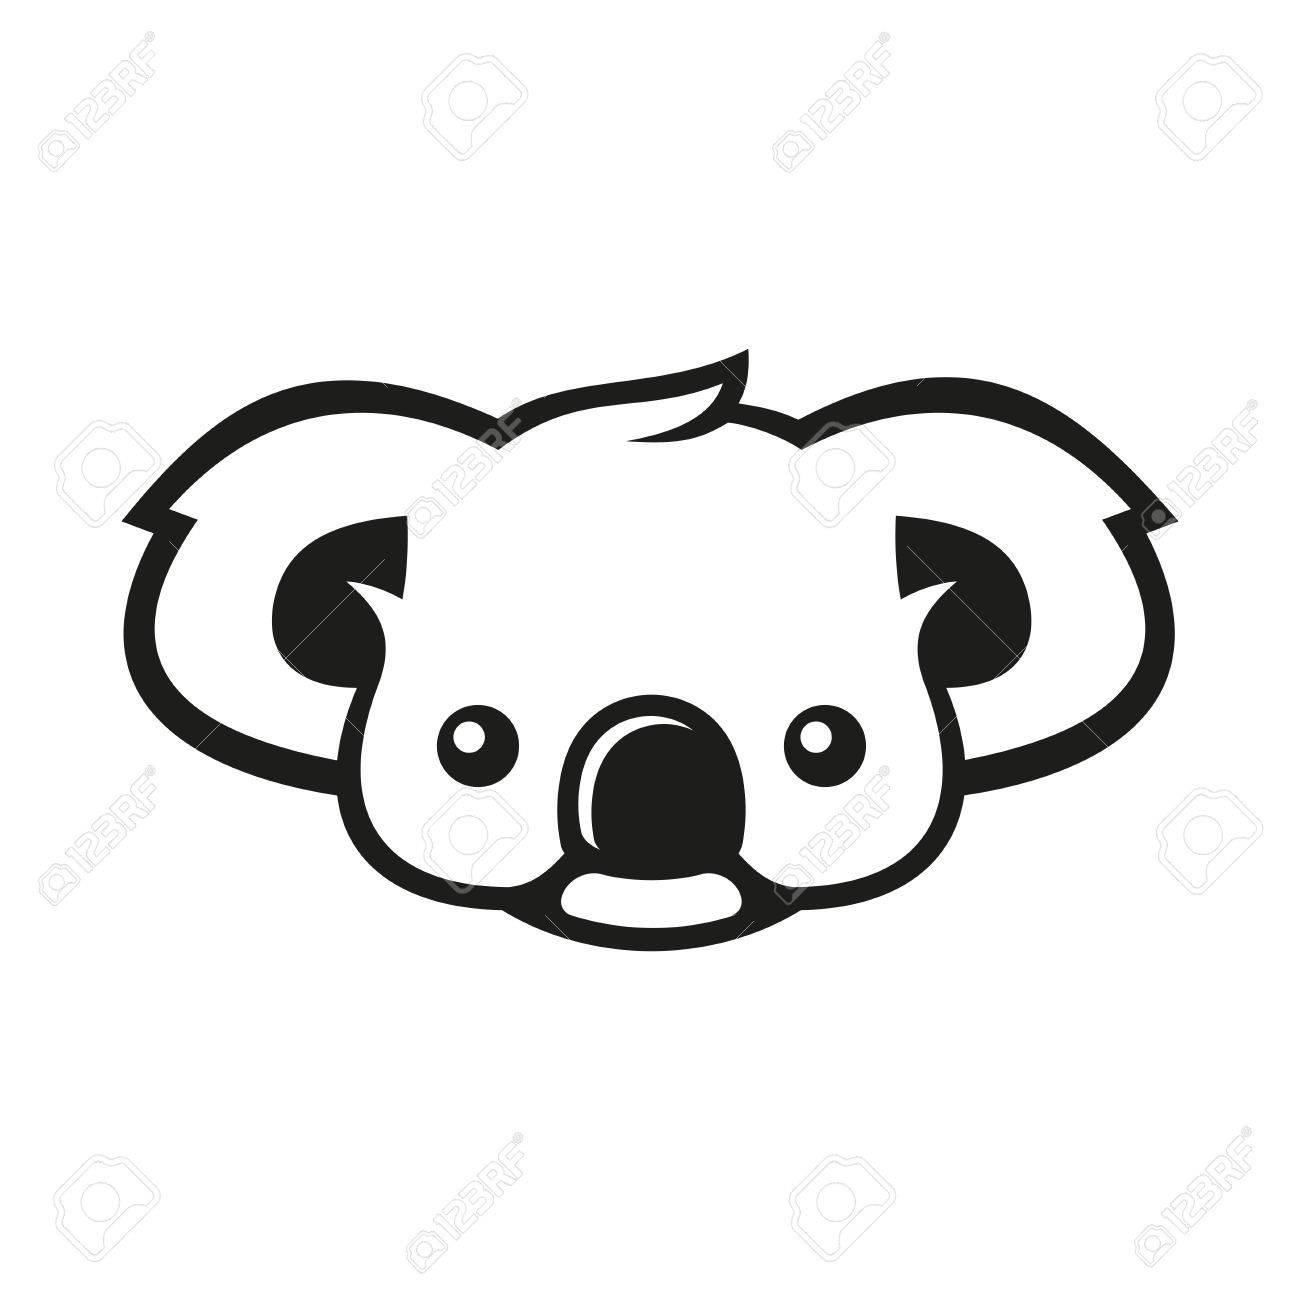 hight resolution of koala bear sign coala vector illustration stock vector 67162729